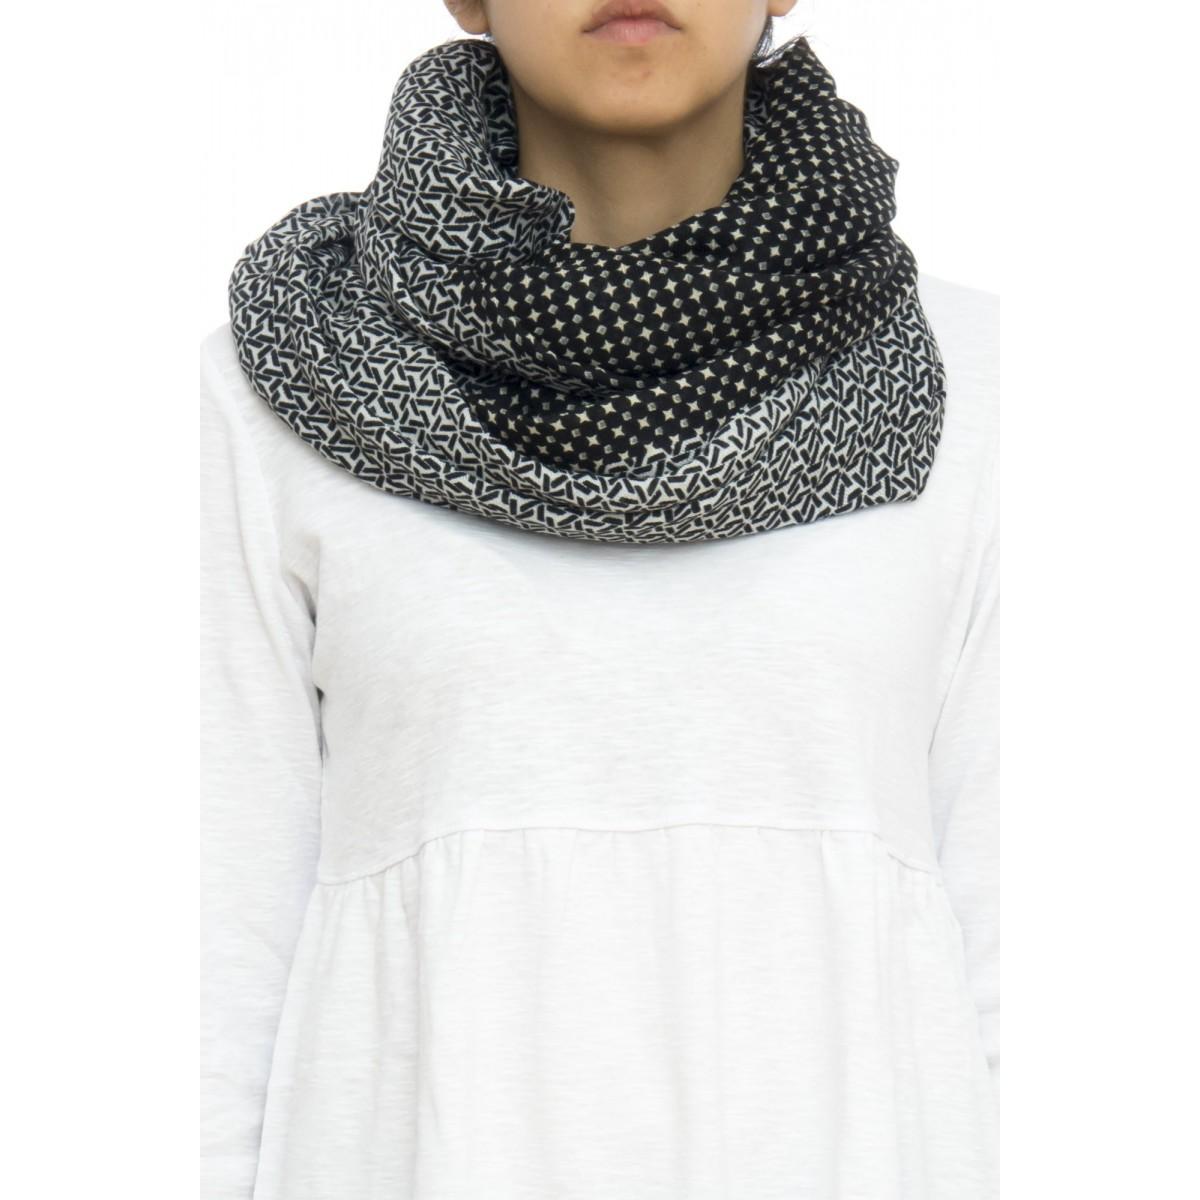 Sciarpa - 1701 rosa 100x200 80% lana 20% seta